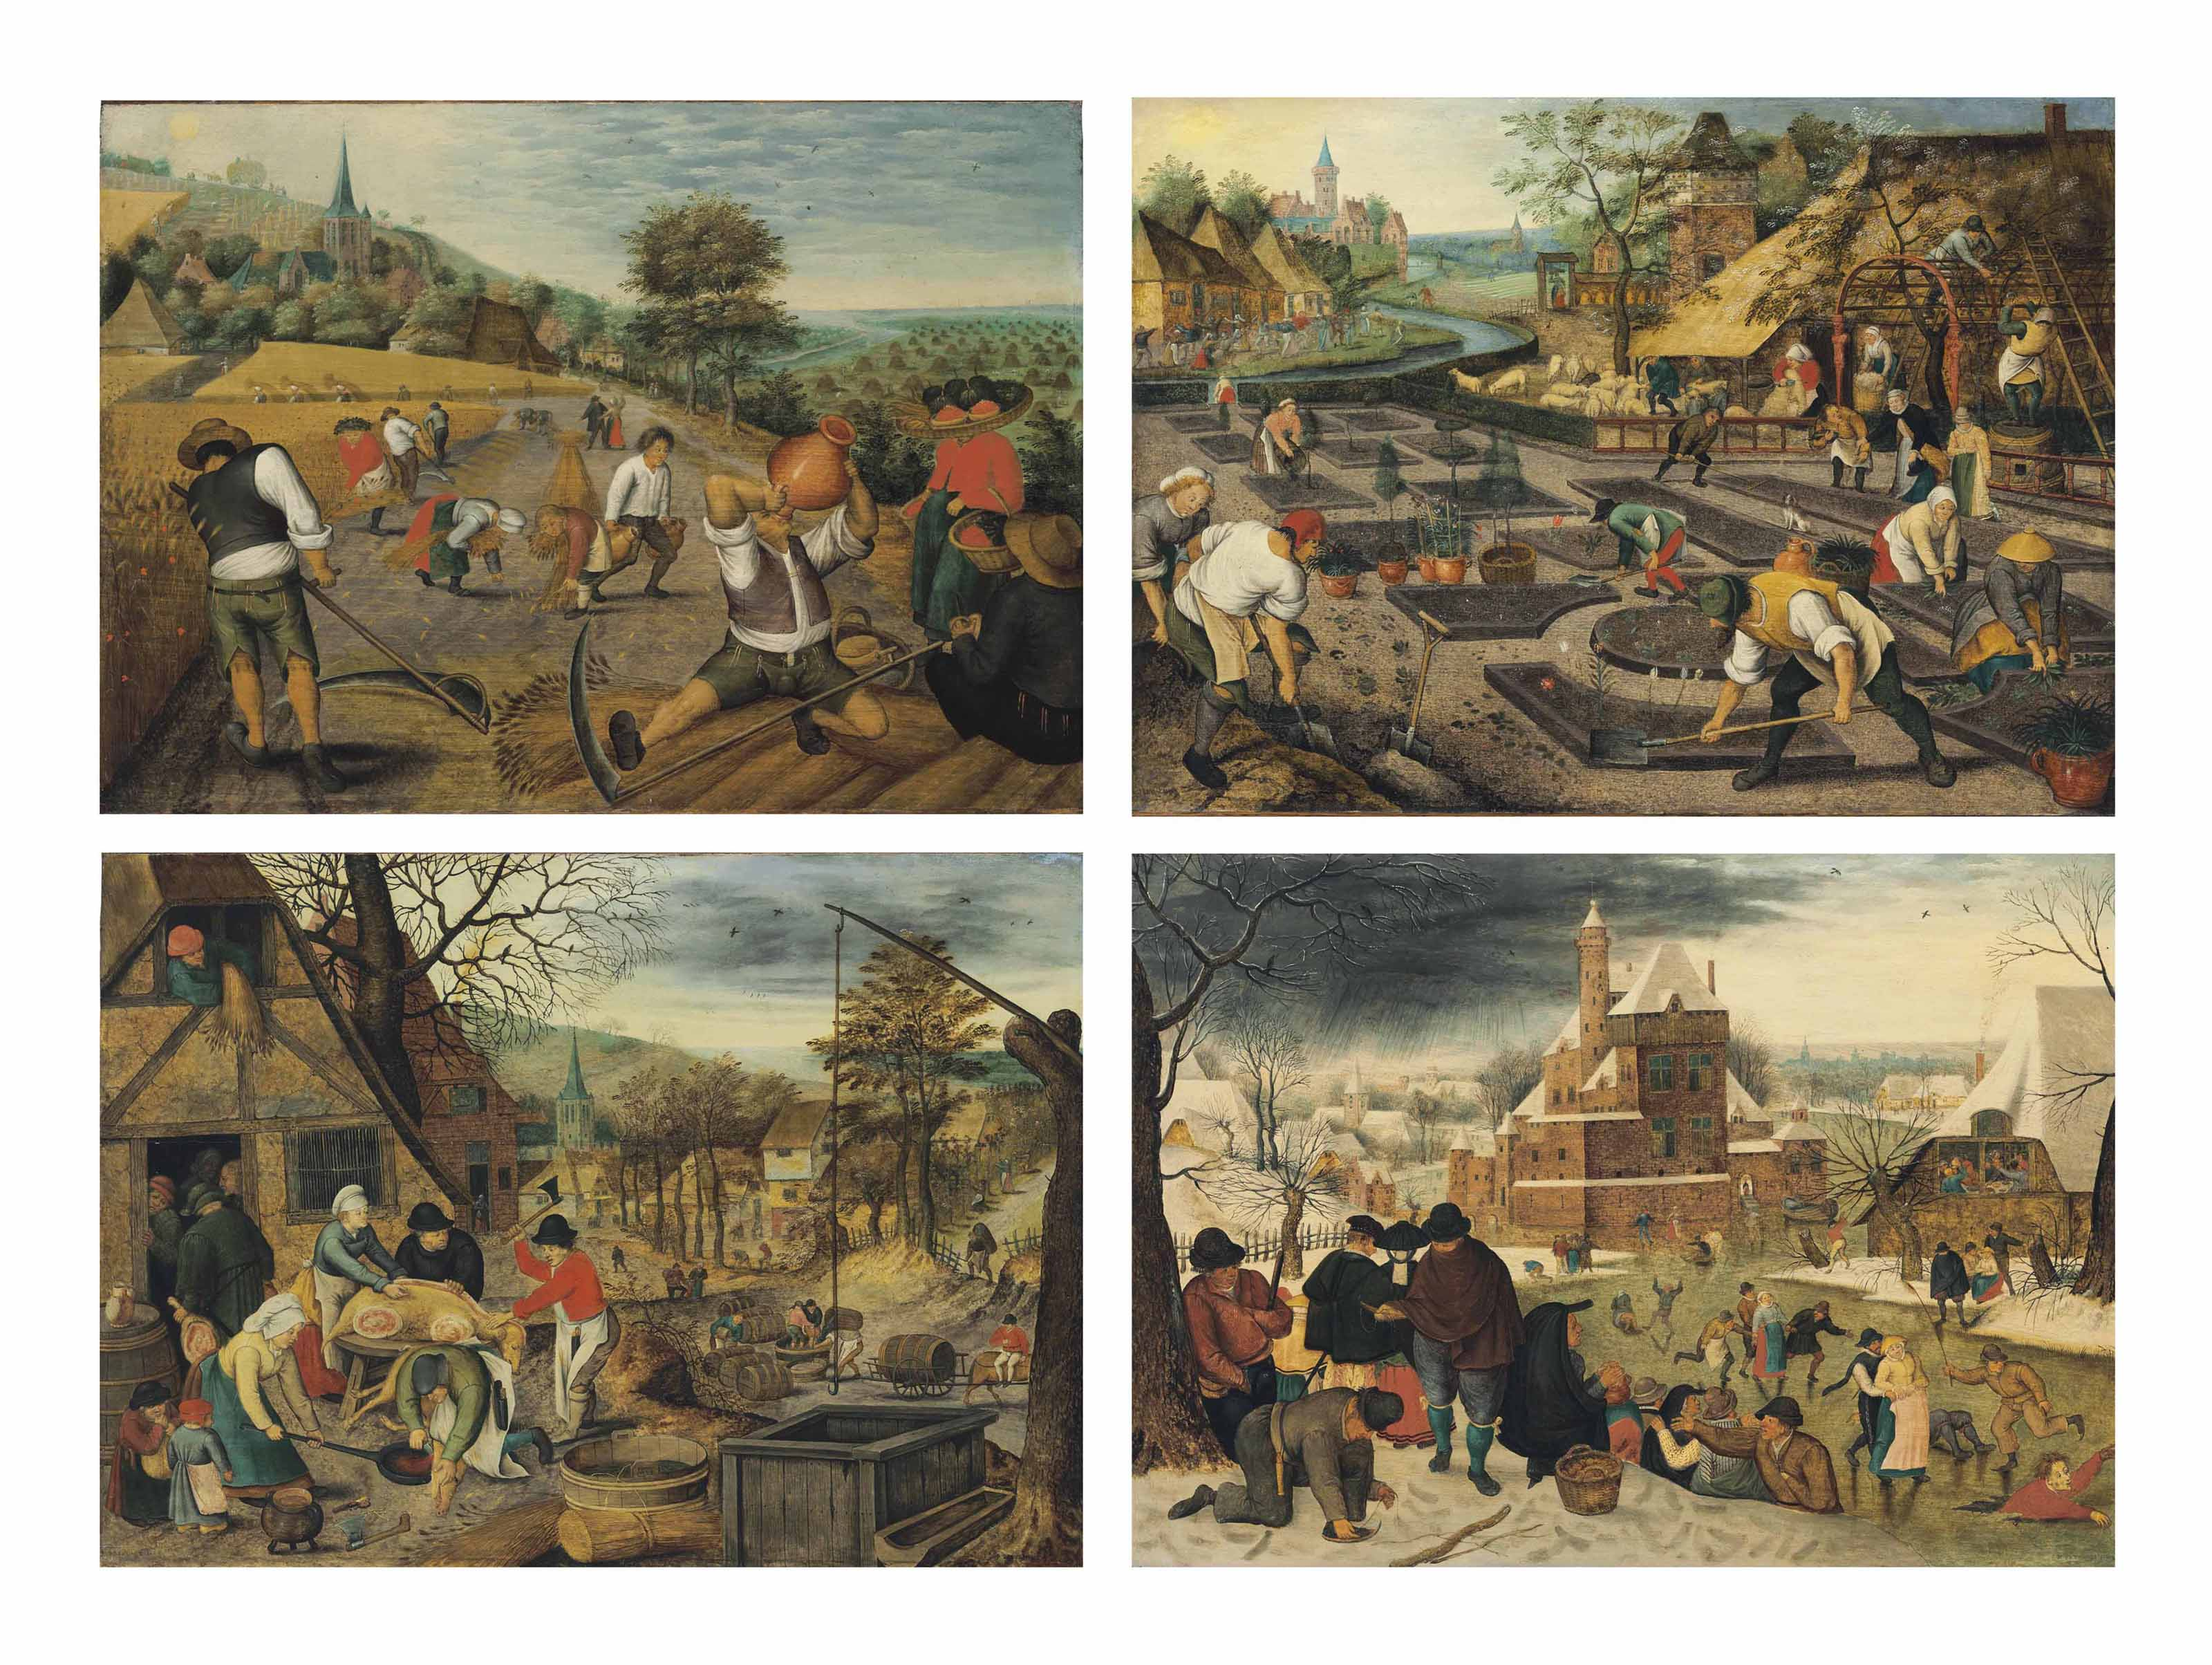 Pieter Brueghel II (Brussels c. 1564-1637/8 Antwerp)